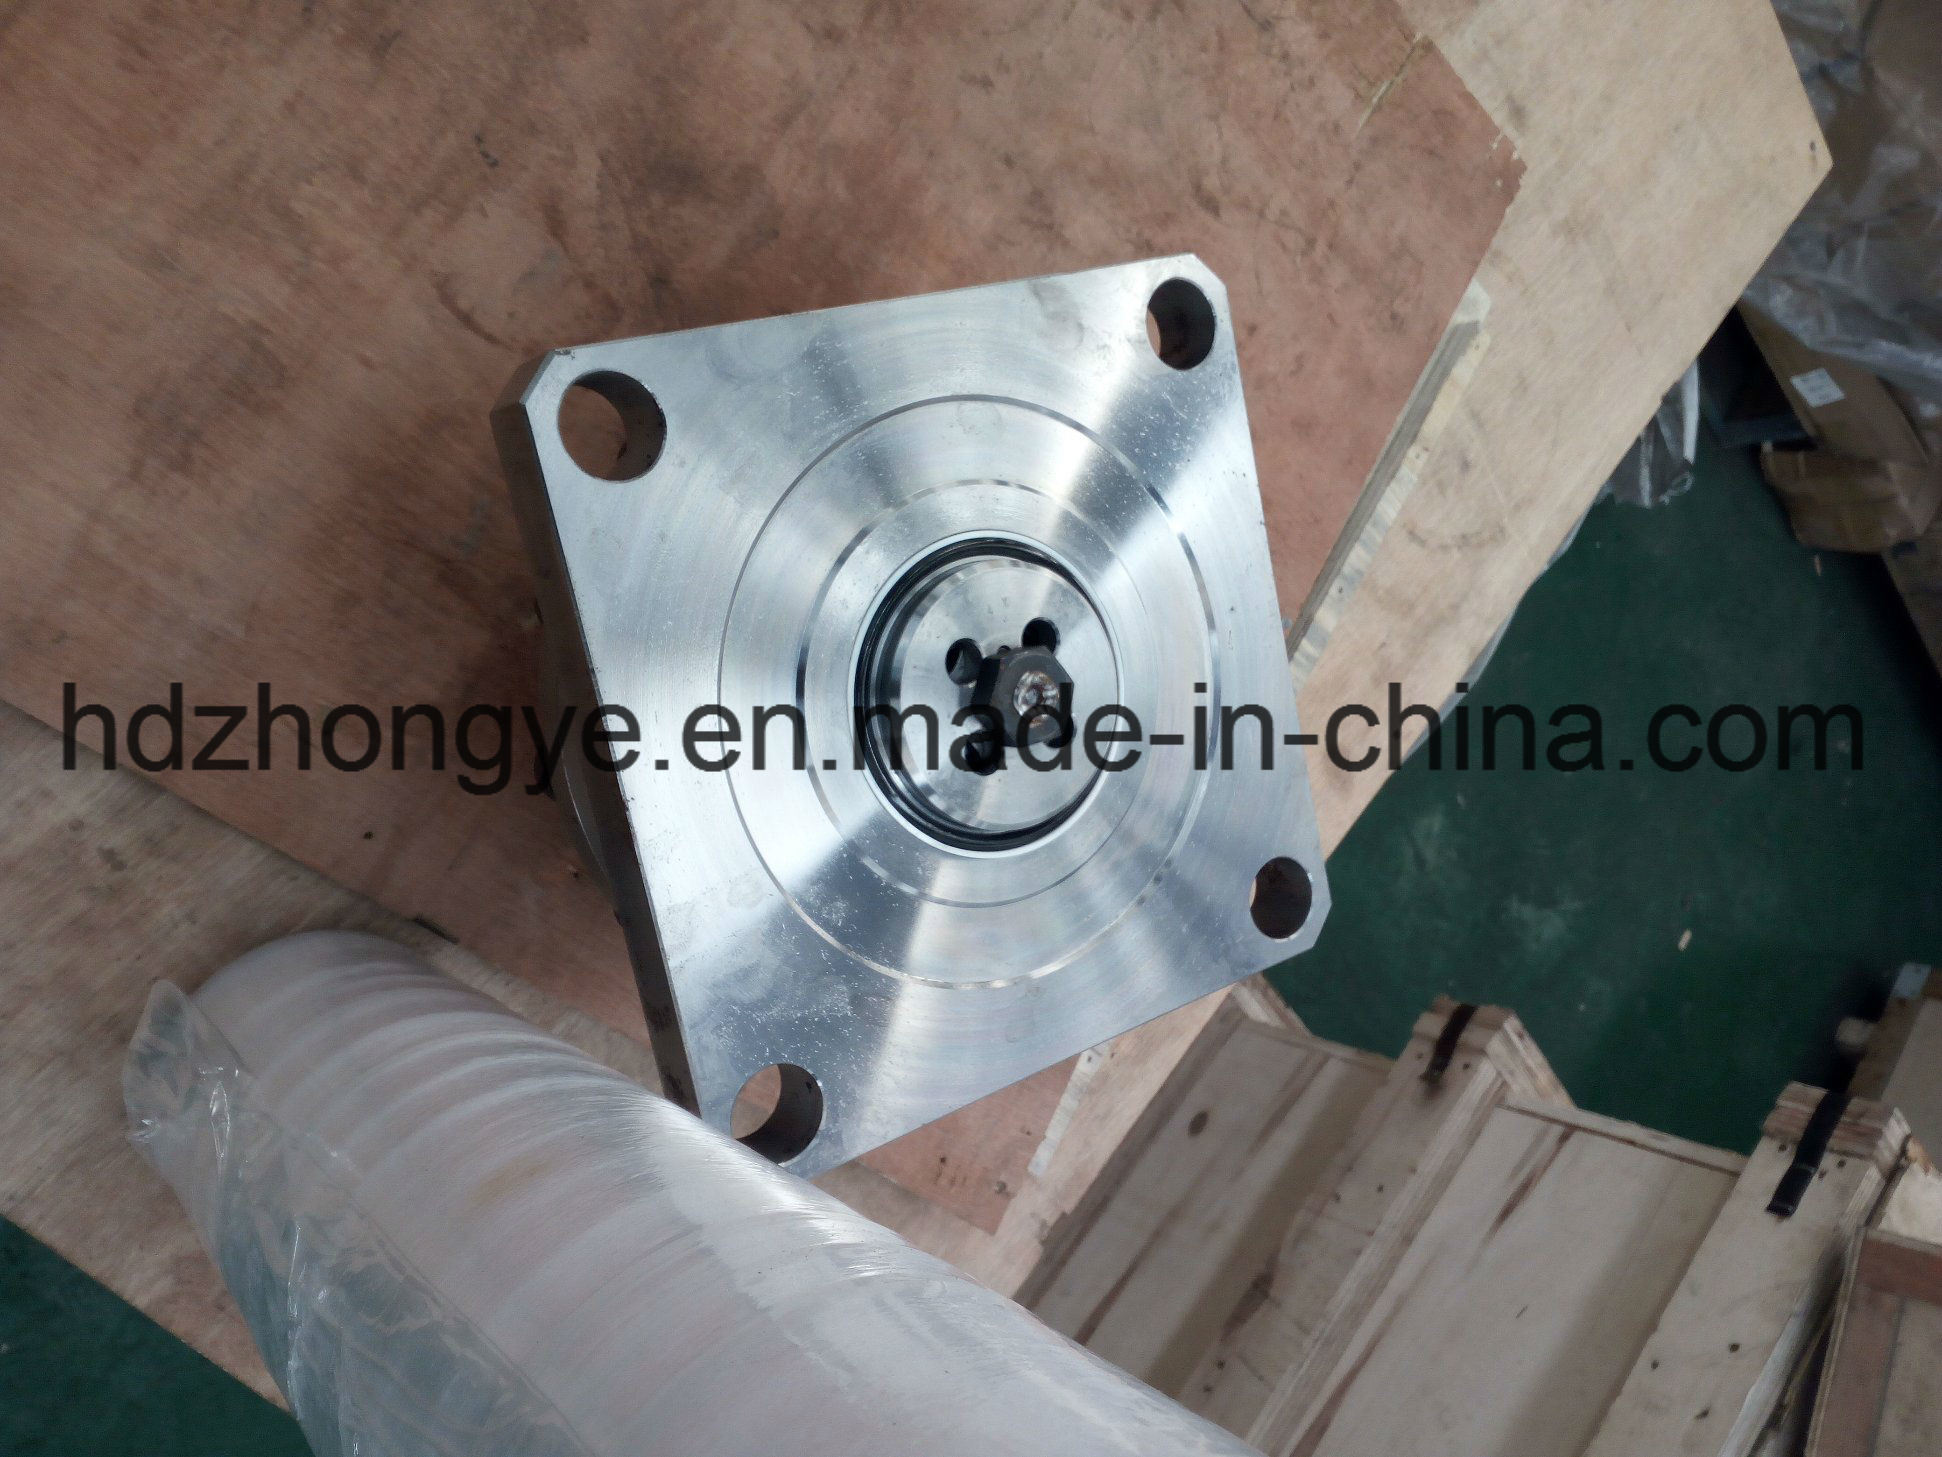 Accumulator for Hydraulic Breaker